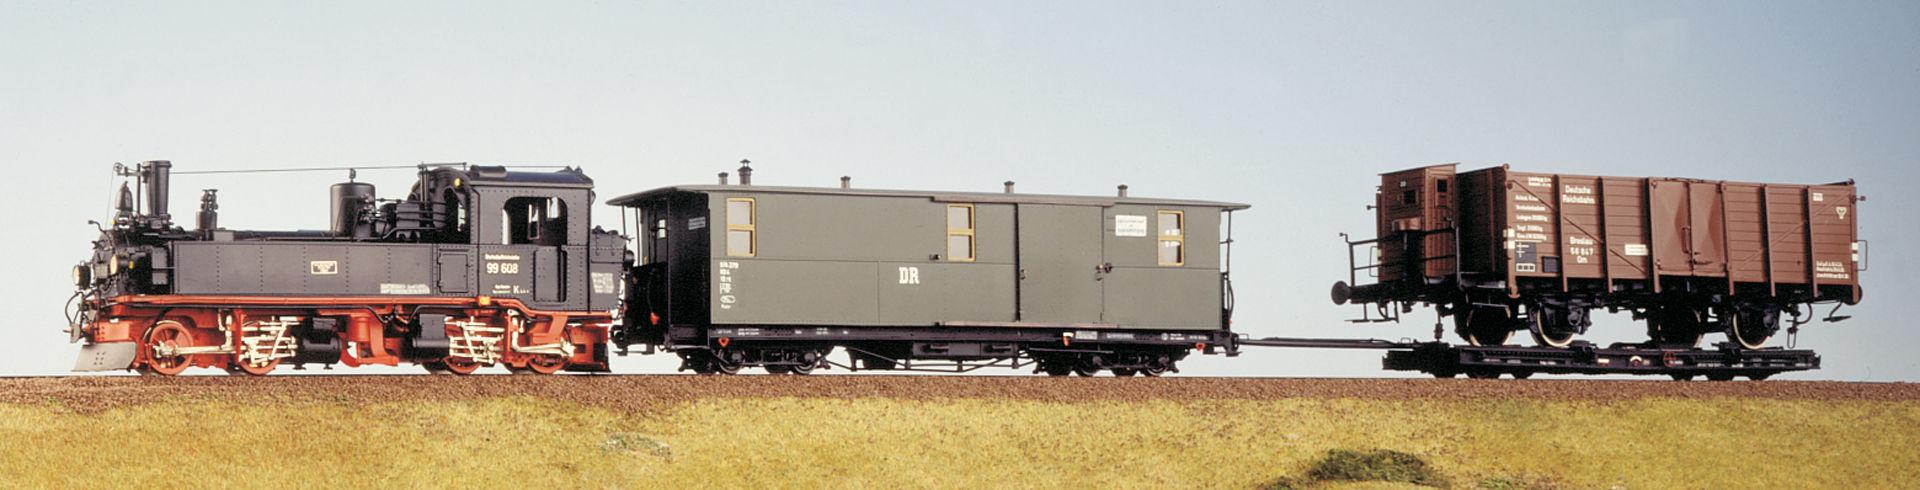 99 608 mit Zug  © Henke Modellbau